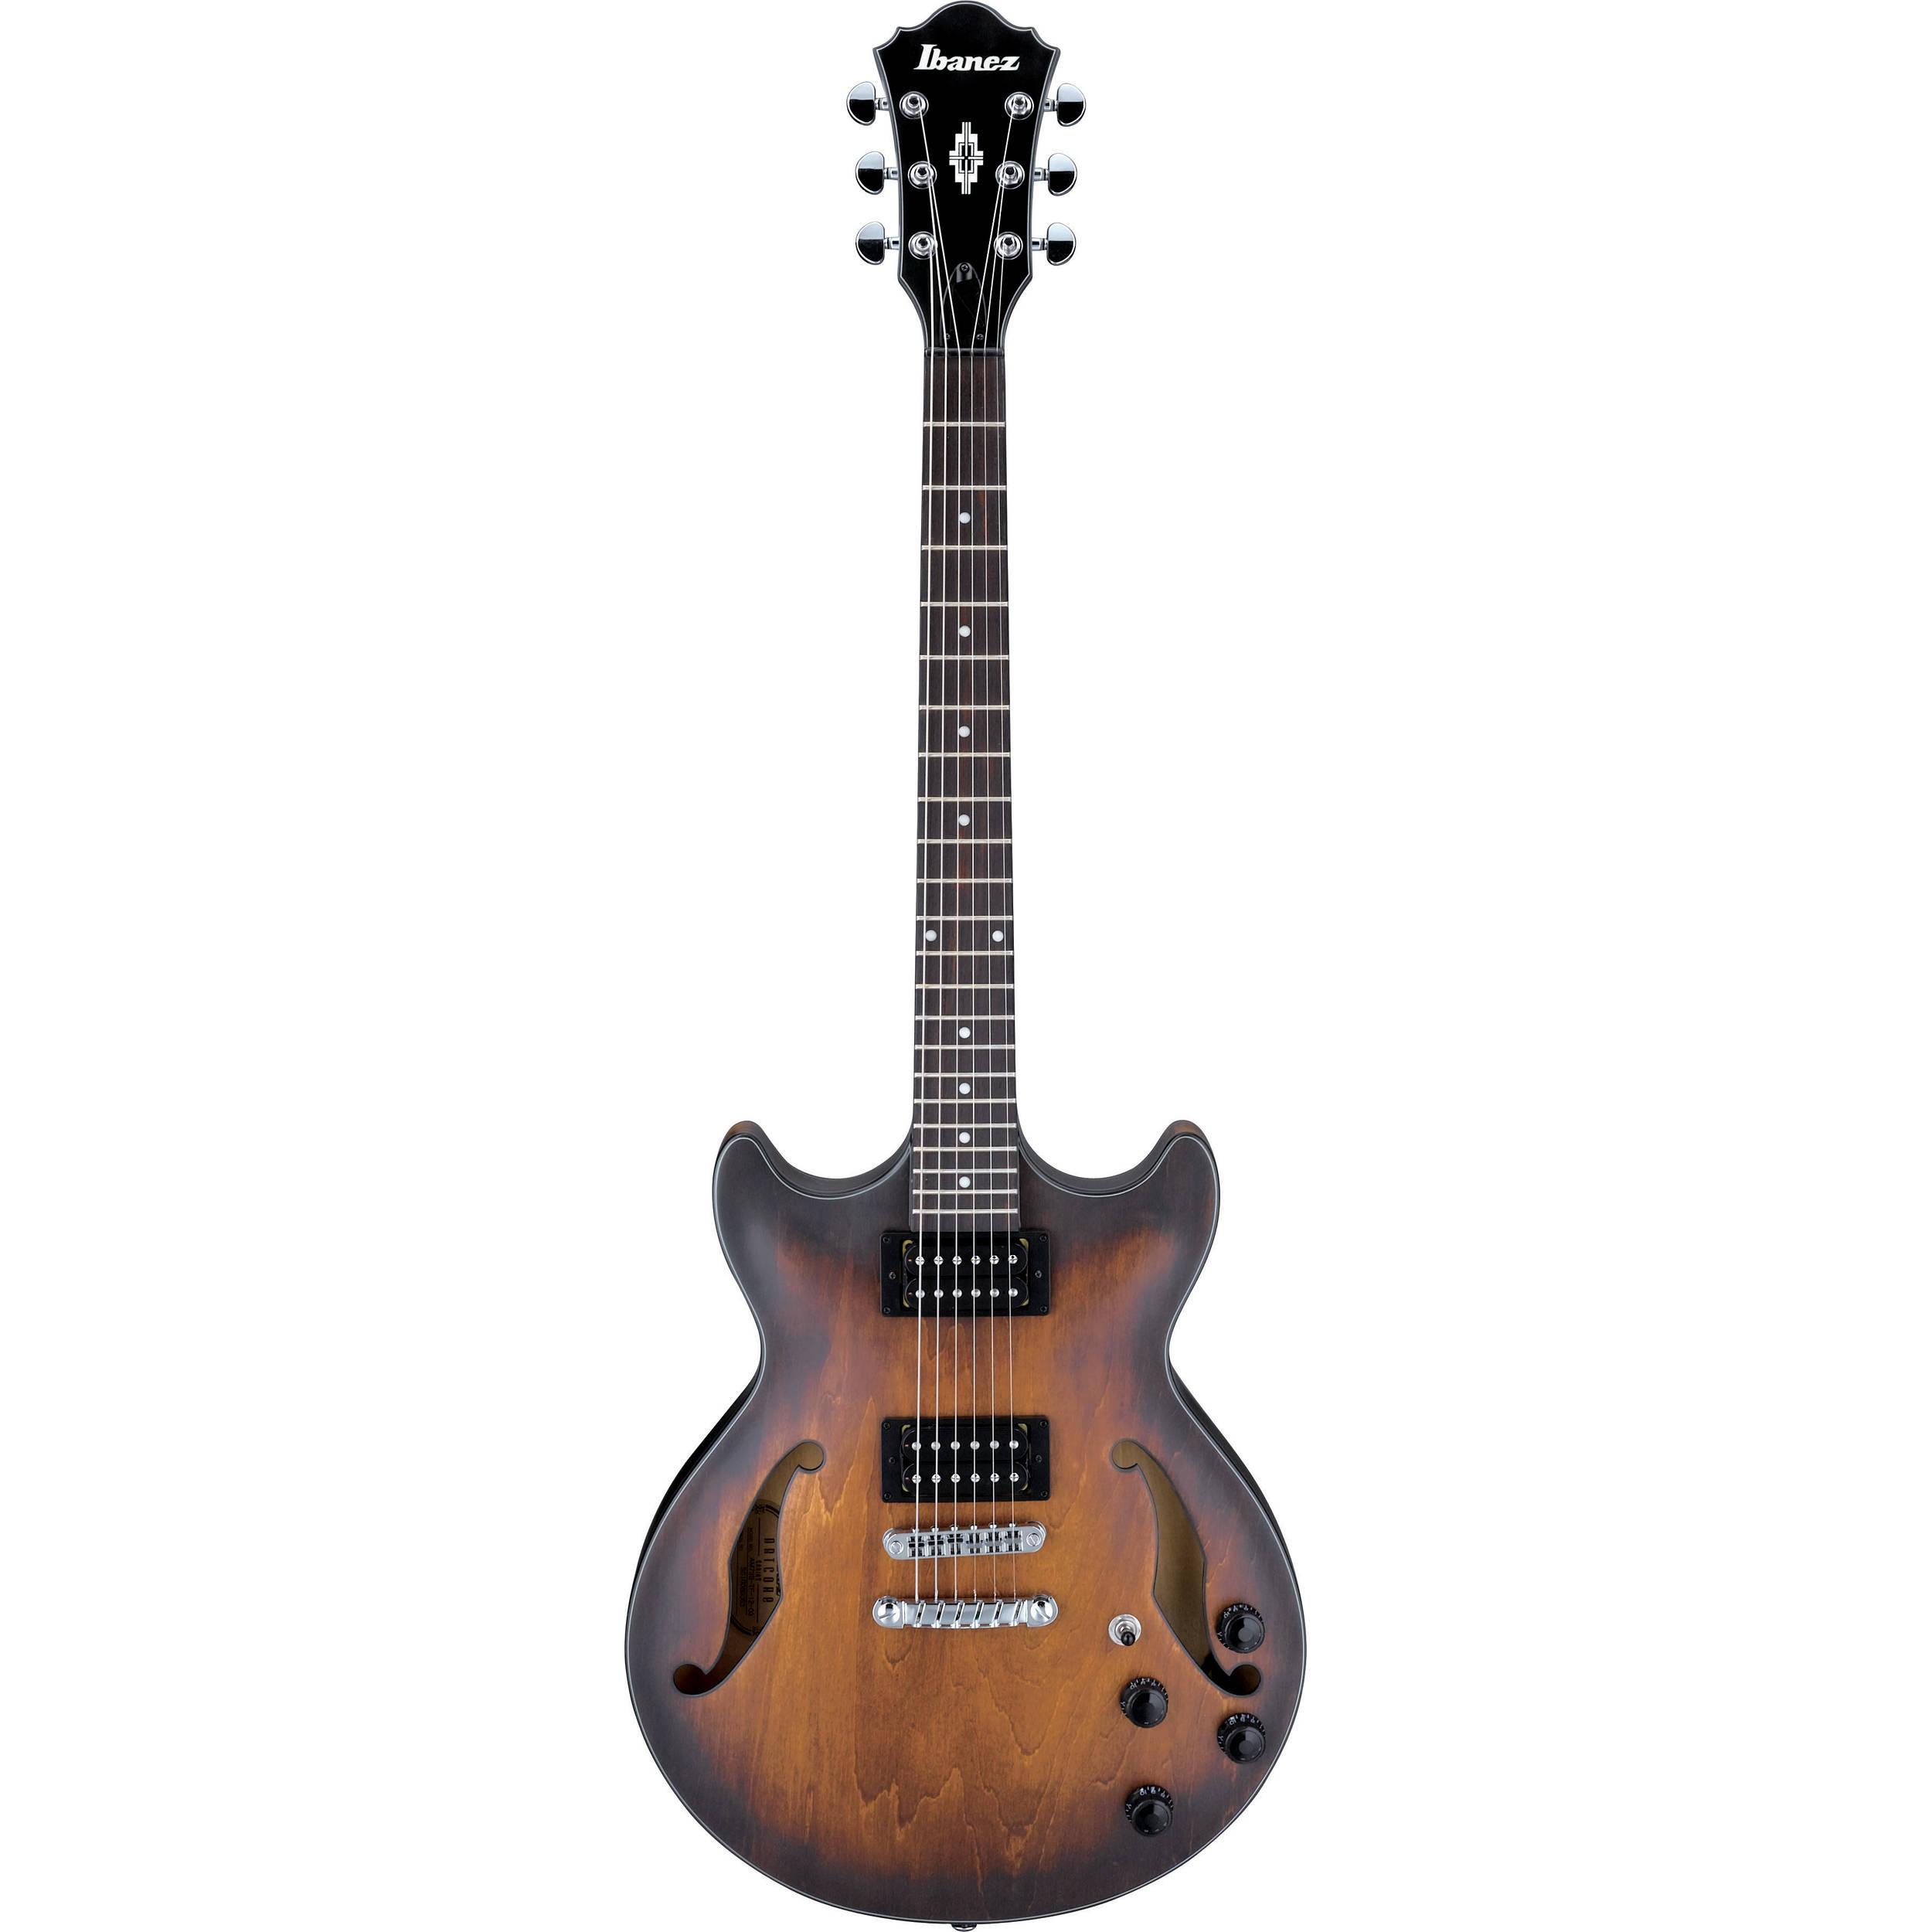 ibanez am73b artcore series hollow body electric guitar am73btf. Black Bedroom Furniture Sets. Home Design Ideas